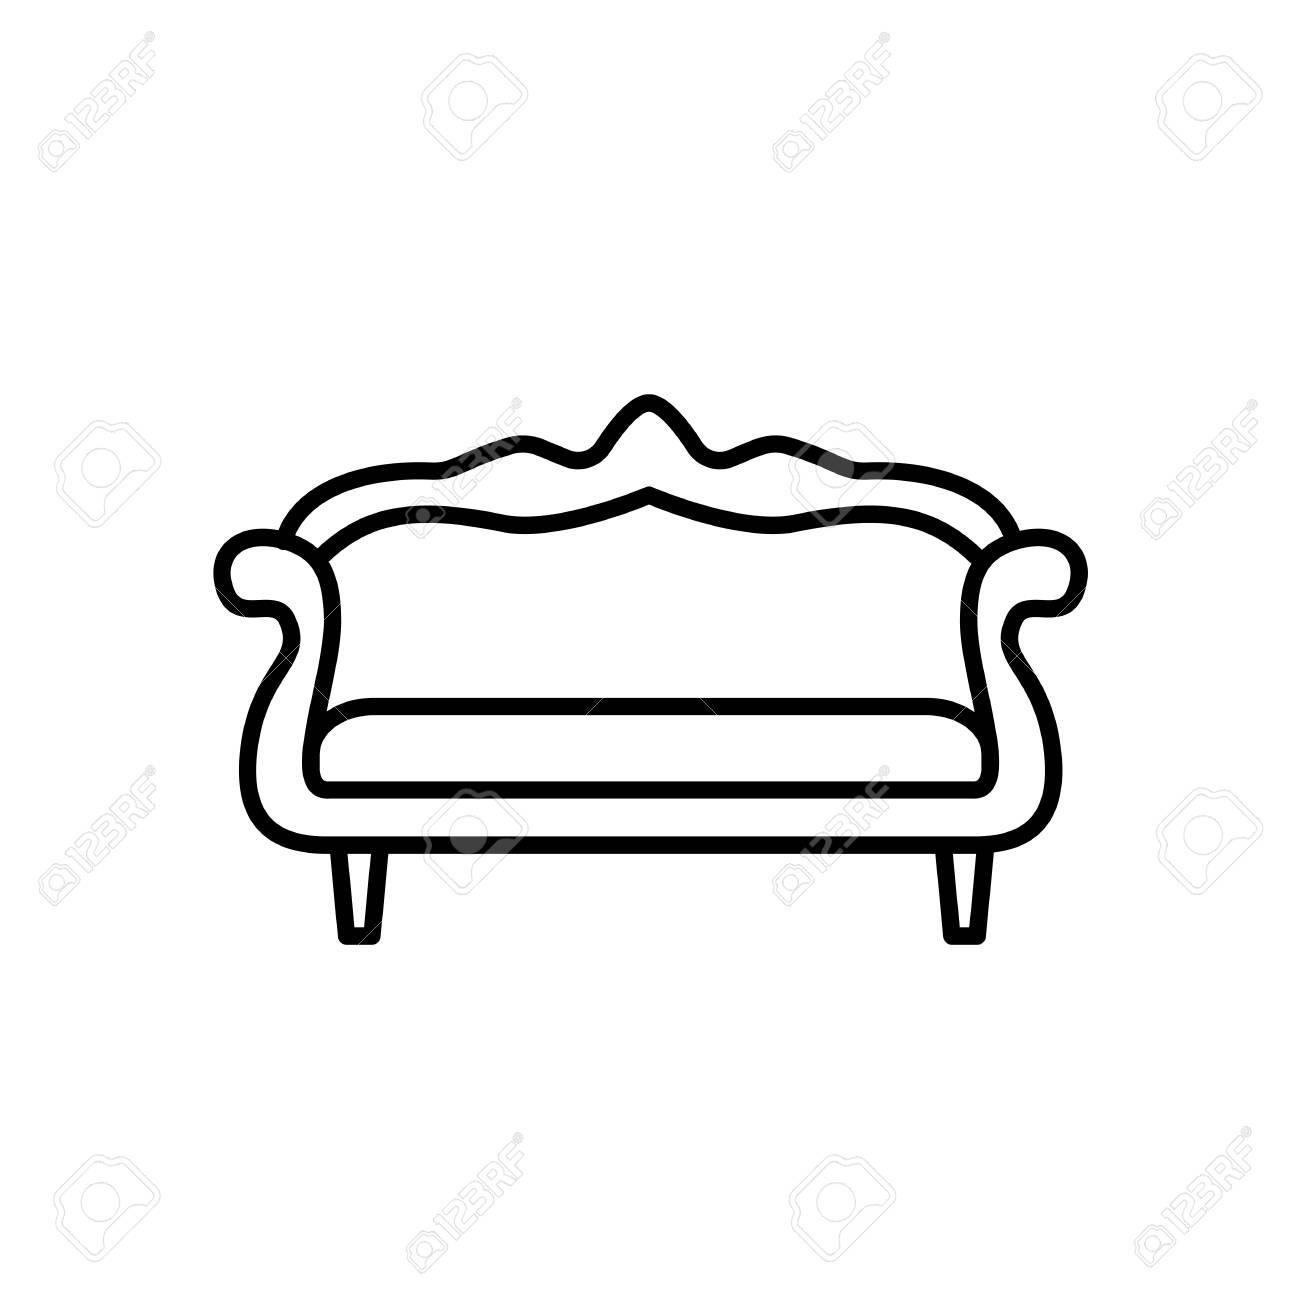 Black White Vector Illustration Of Camelback Sofa Line Icon